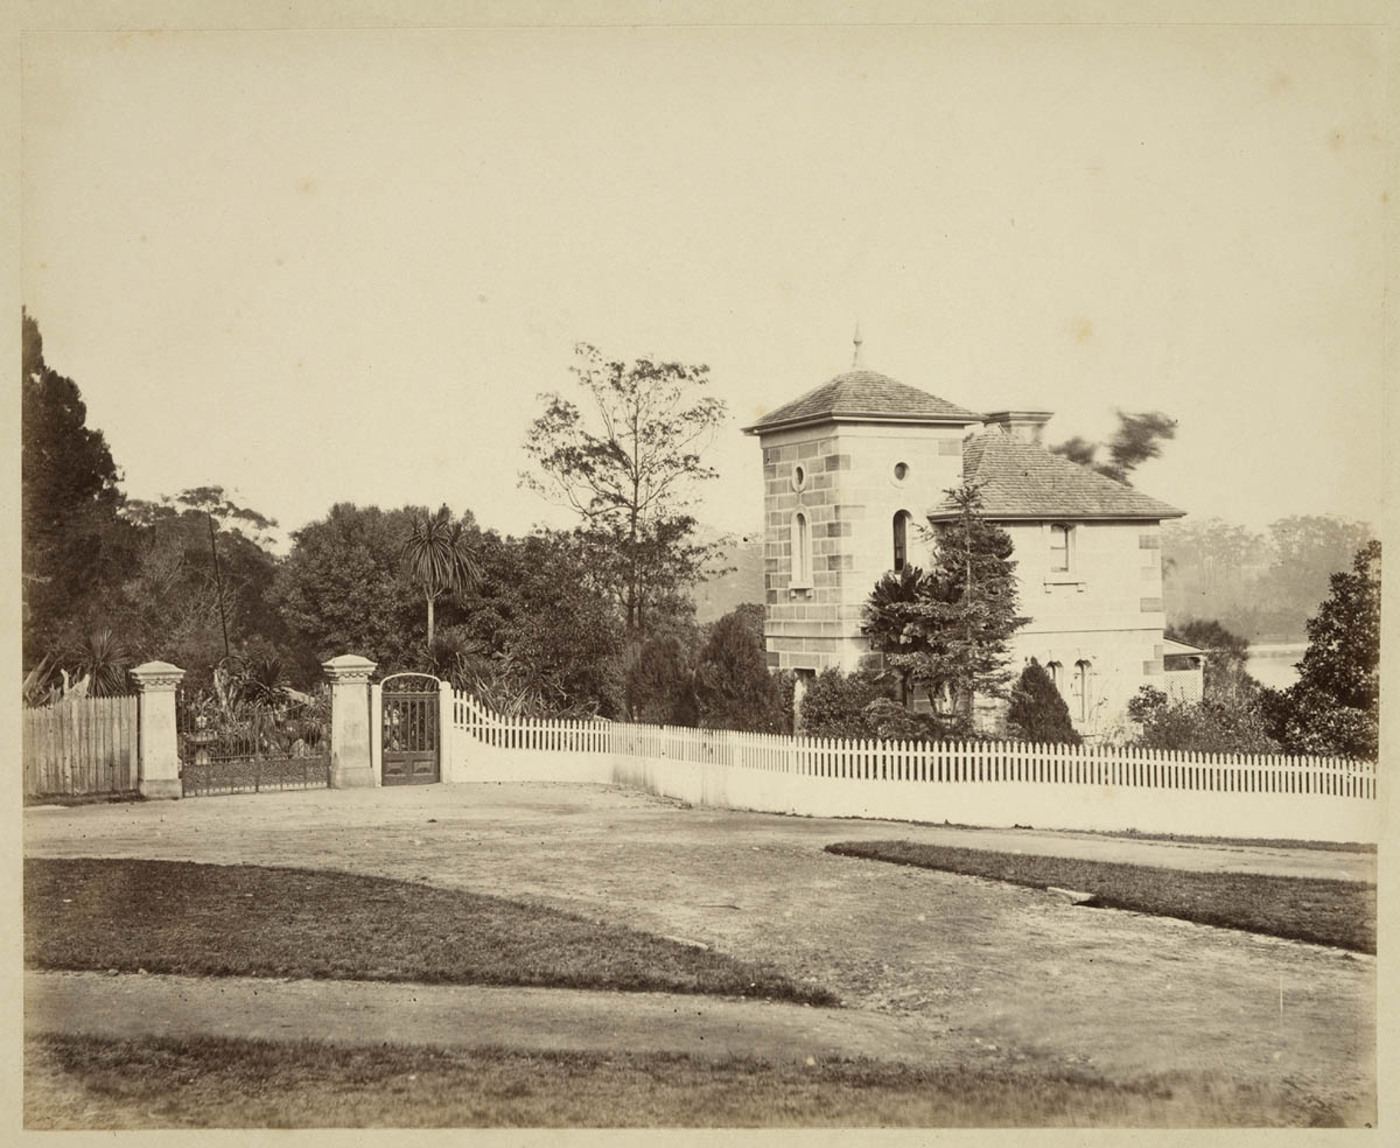 Gatehouse at Botanical Gardens, c. 1879, by Tronier Artist Photographer